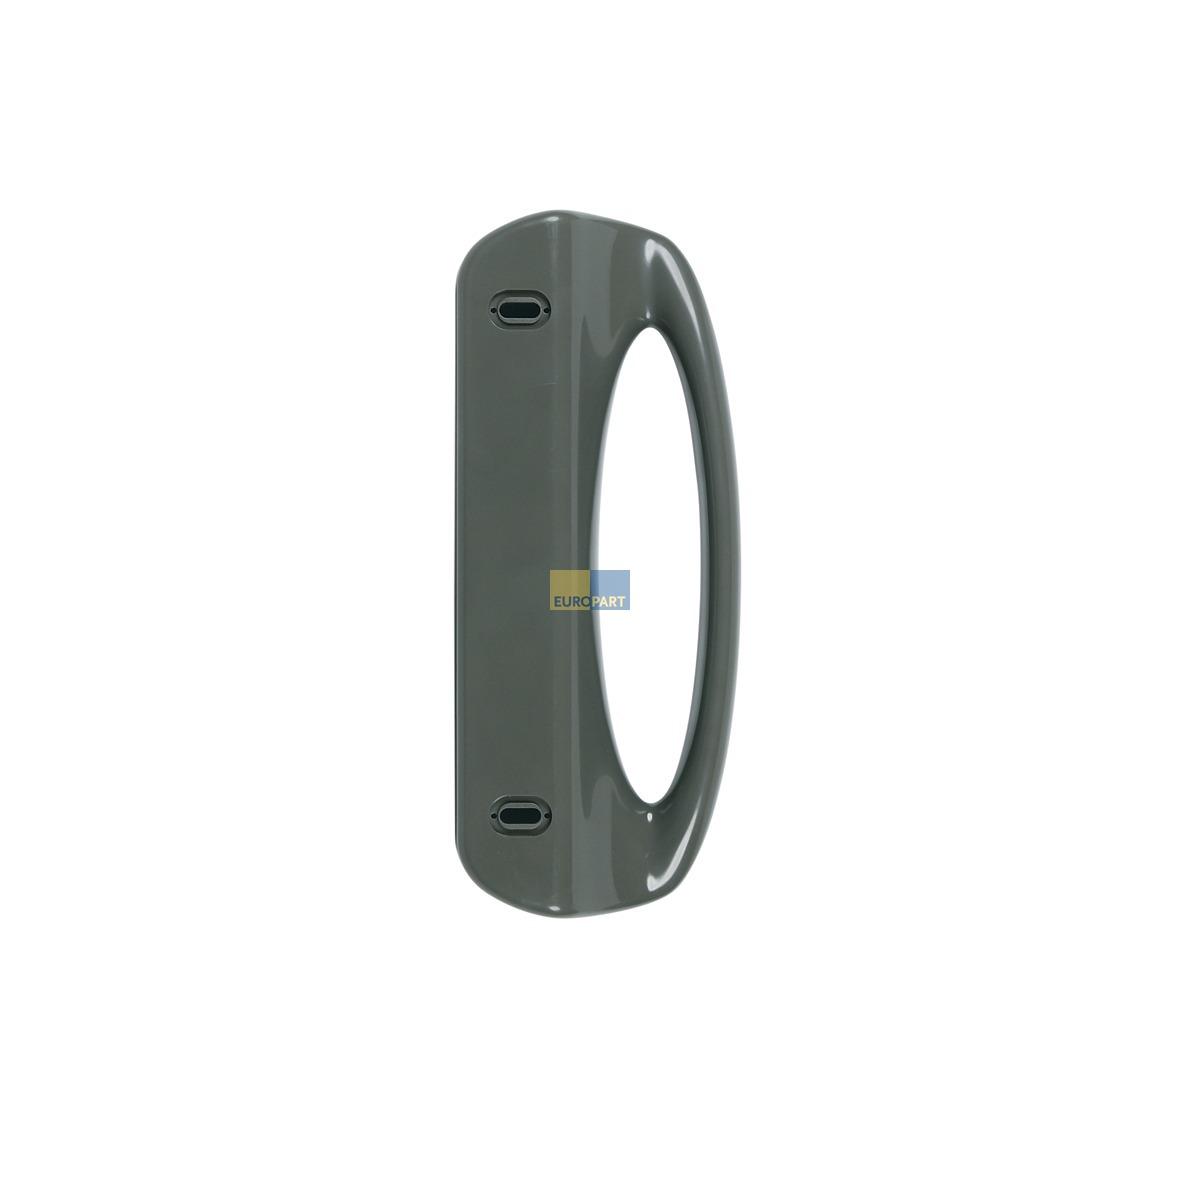 Türgriff grau senkrecht Electrolux 206176605/7 OT! - ABEA Hausgeräte ...